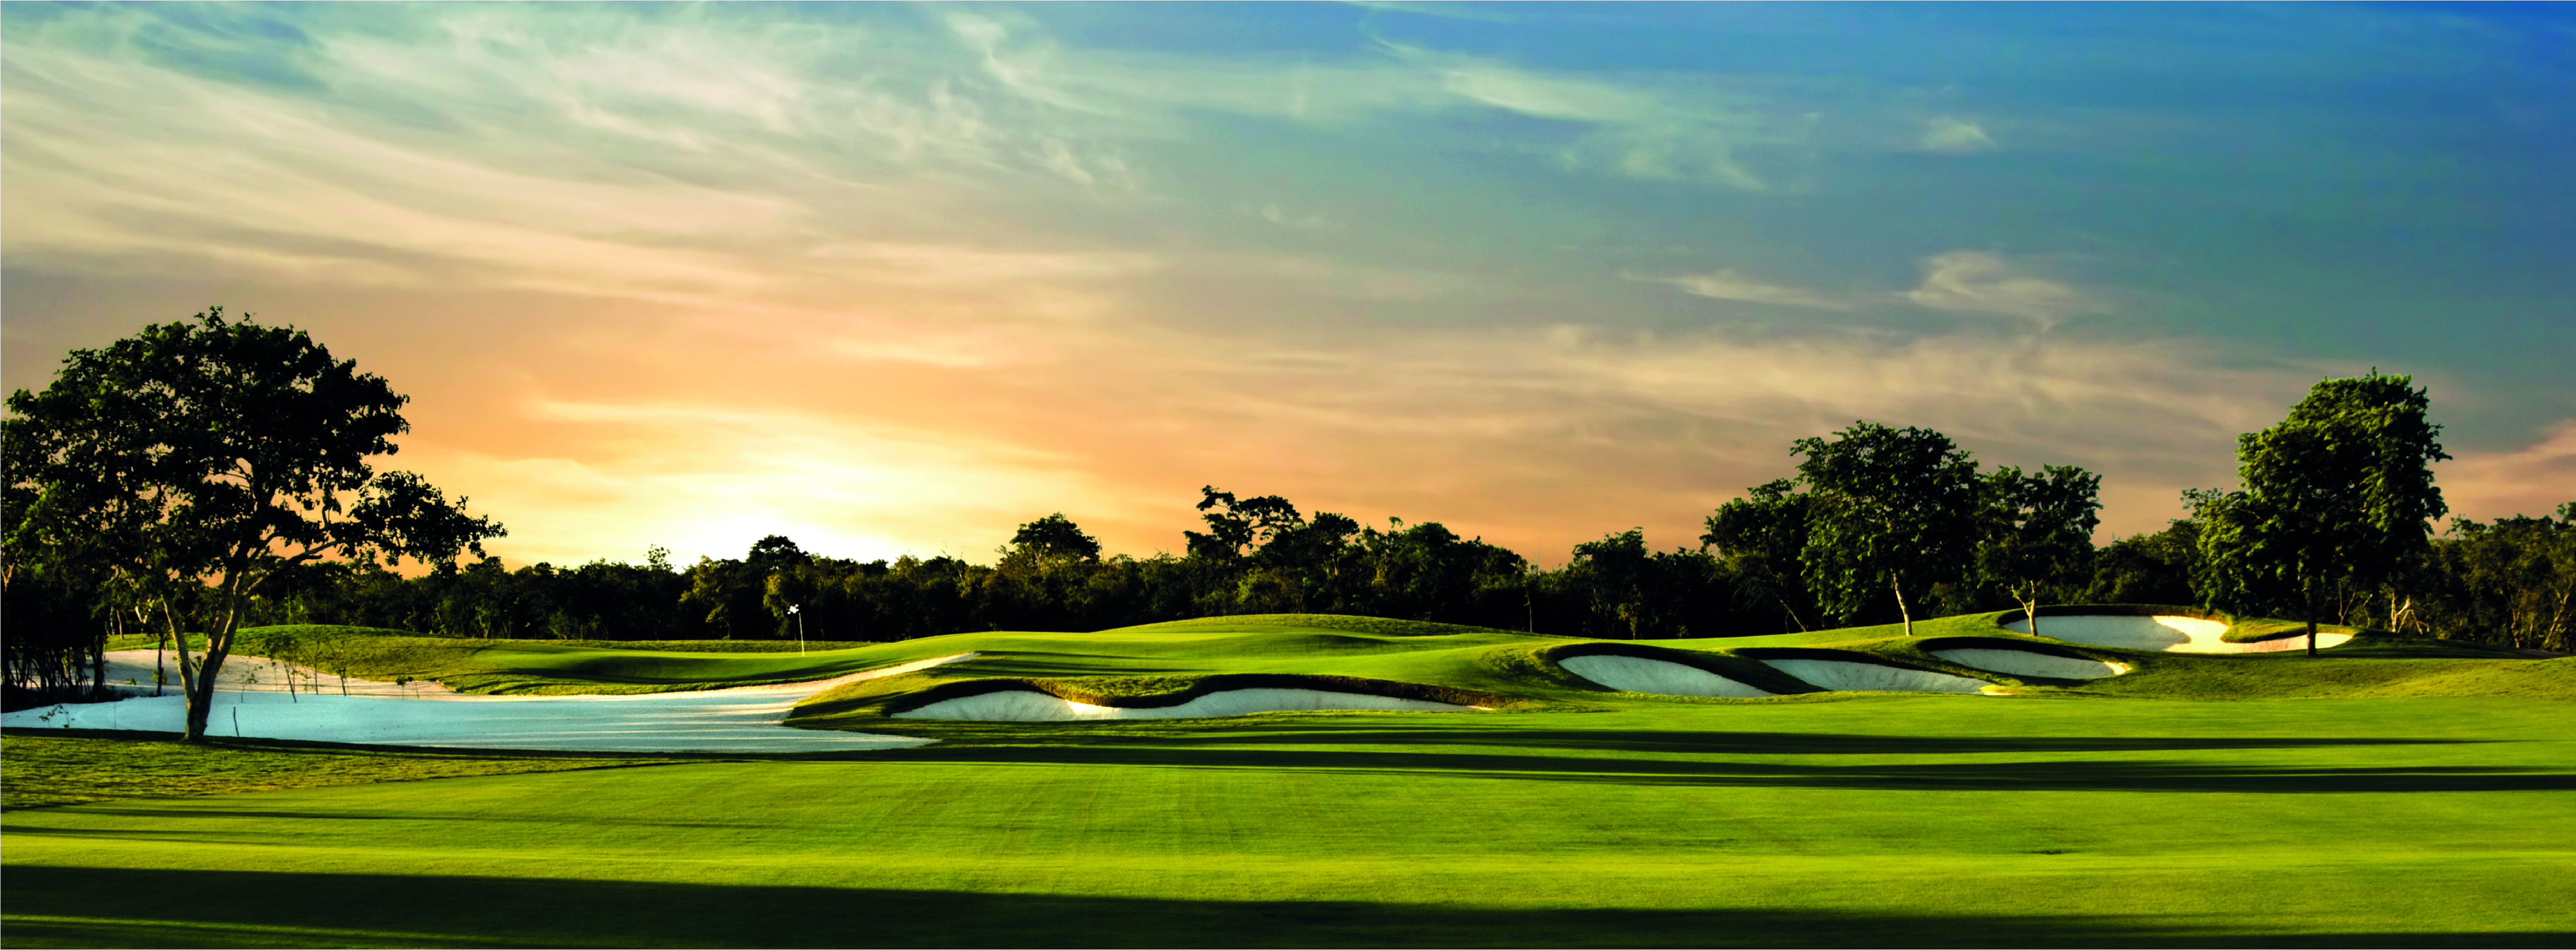 El jaguar golf course. Real state development, Yucatan Country Club.